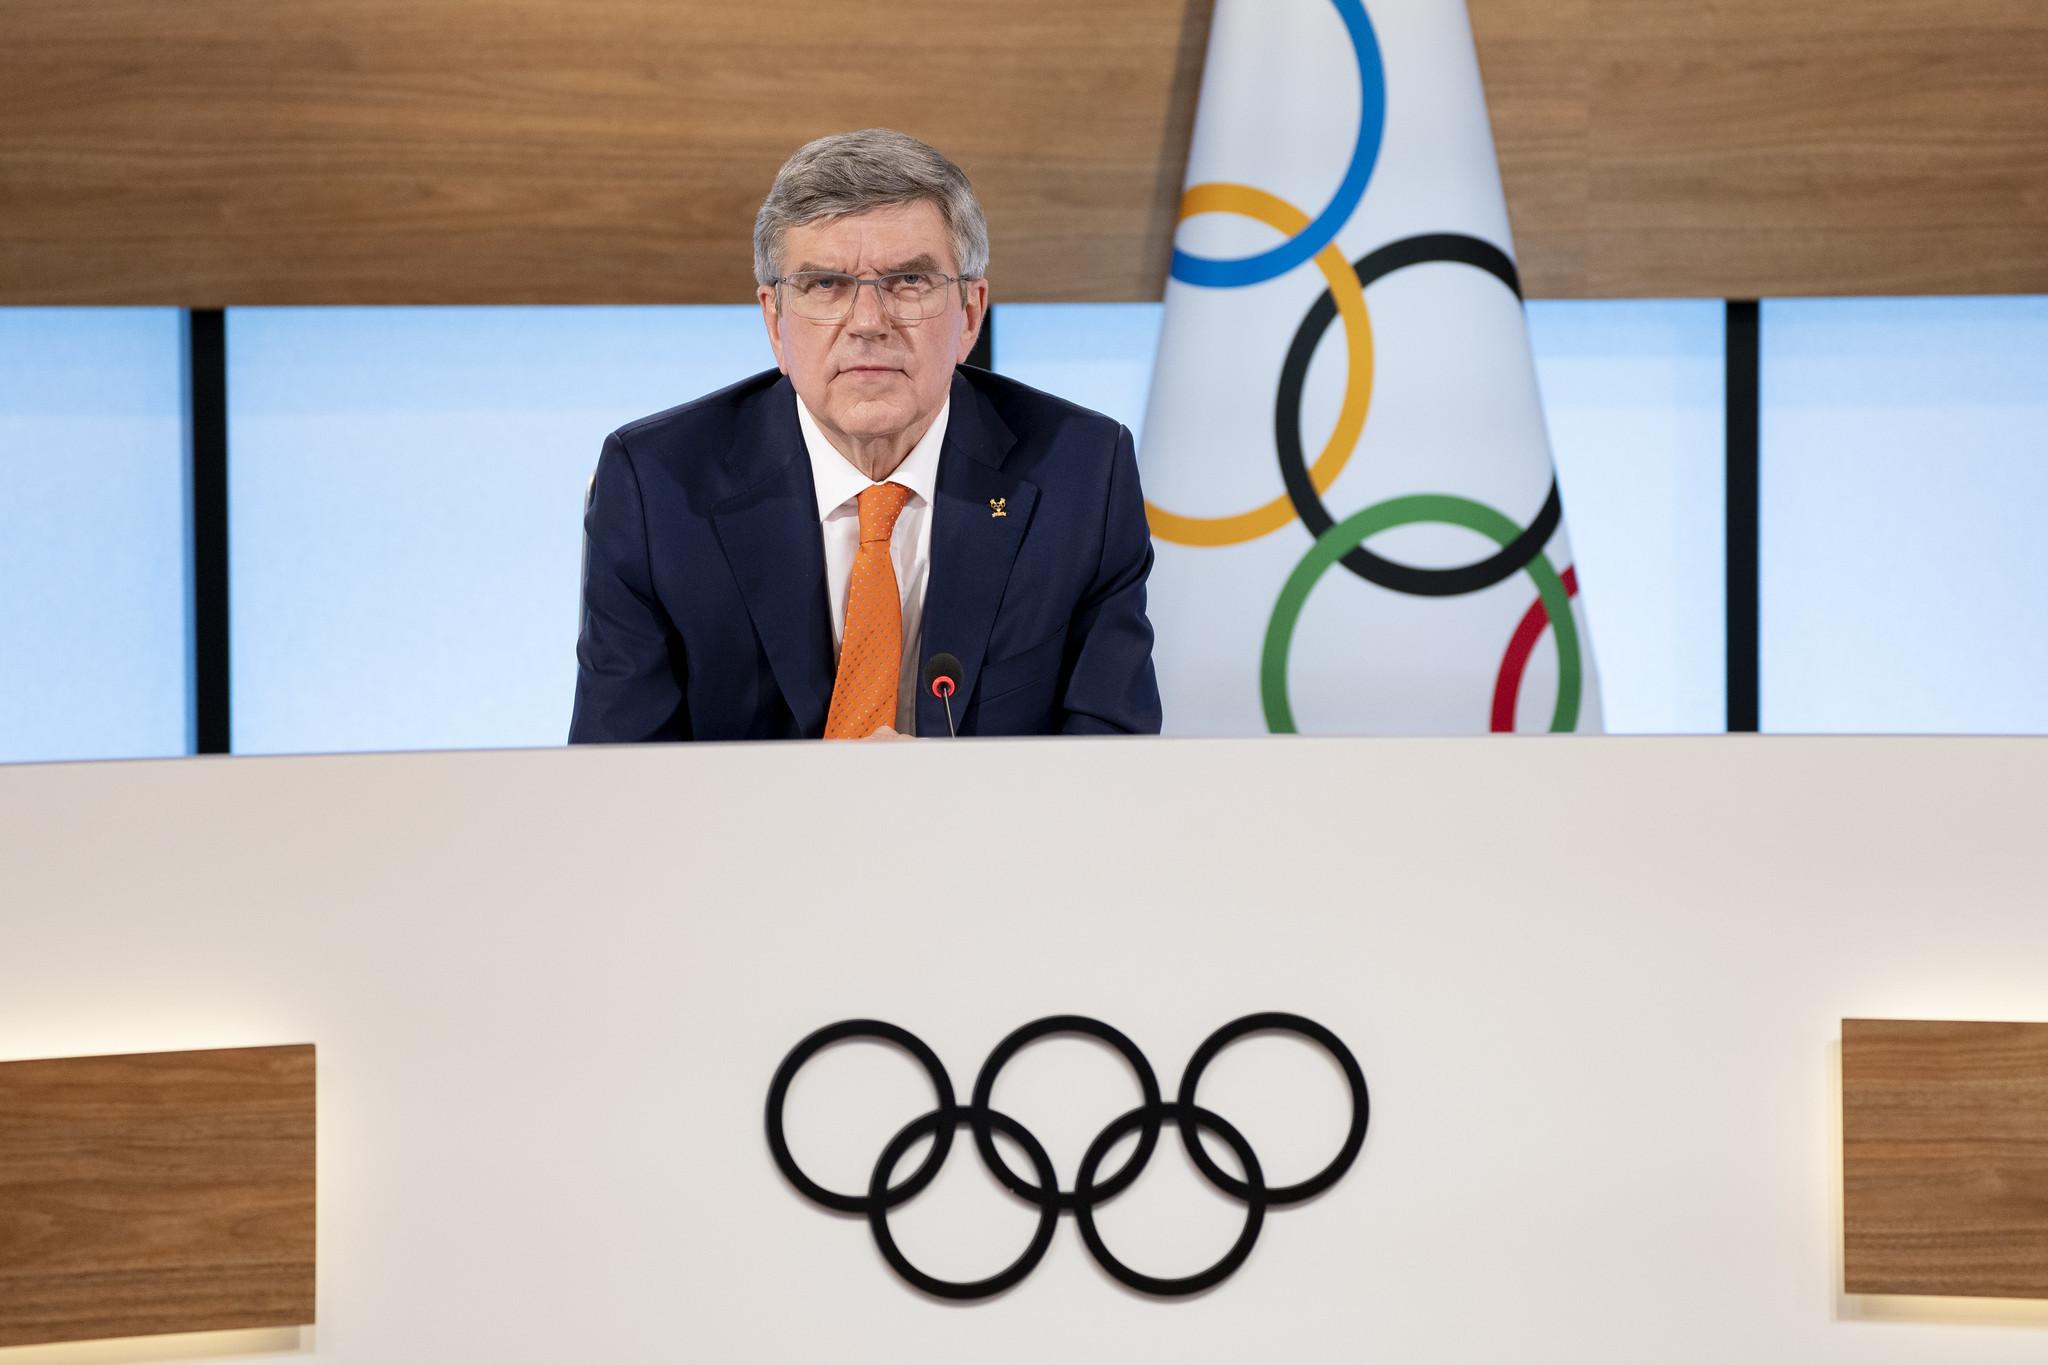 IOC President Thomas Bach will chair the meeting, to be held virtually due to the coronavirus pandemic ©IOC